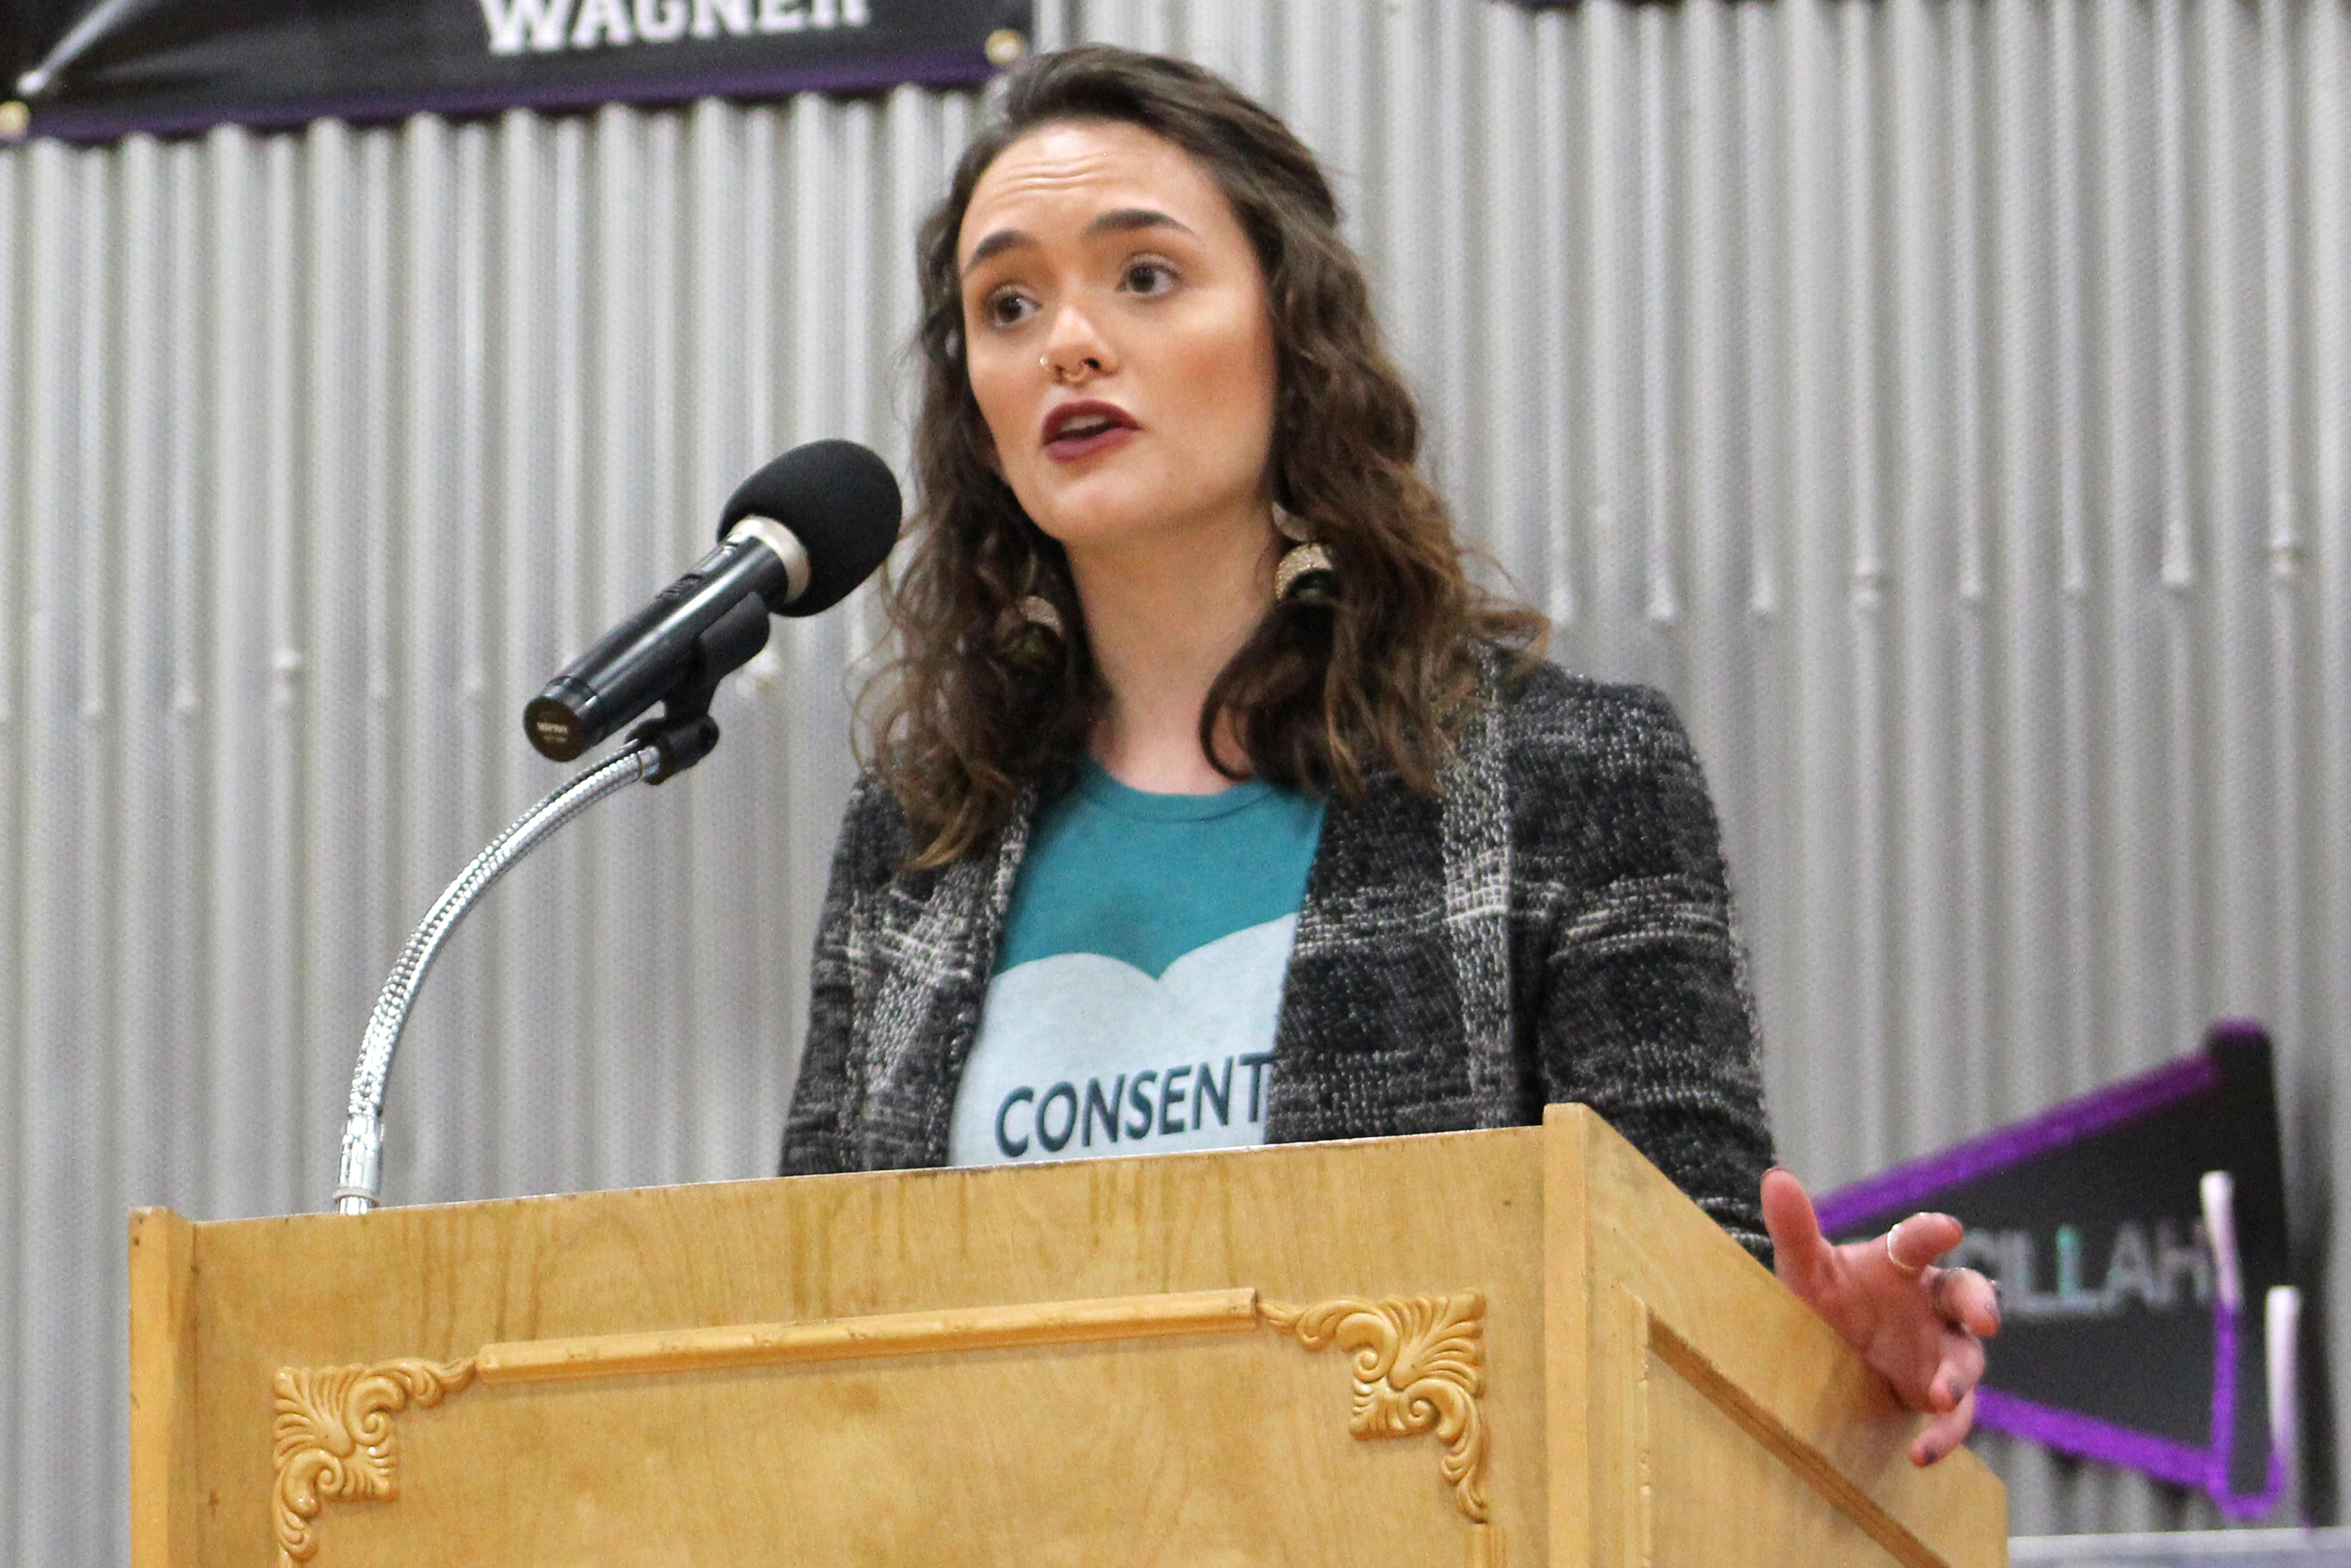 Audrey Yazell from MOCSA explains Title IX regulations as a part of Sexual Assault Awareness Month March 28.